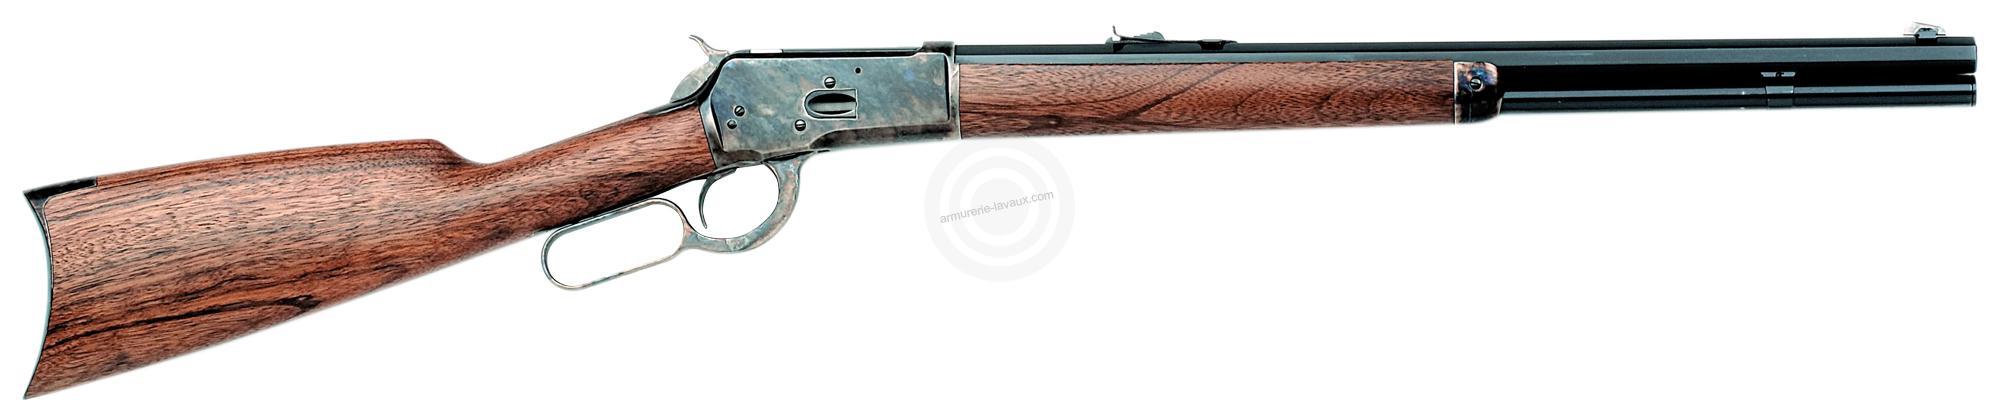 Carabine CHIAPPA 1892 Lever Action Canon Octogonal cal.357 Mag